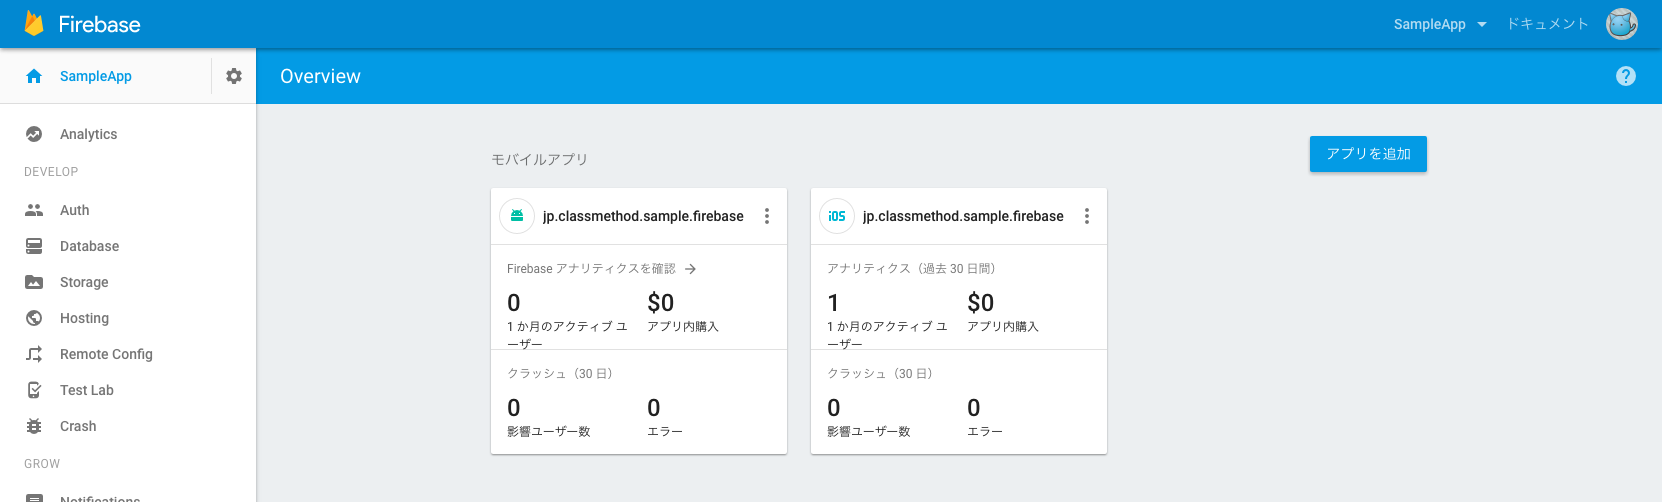 firebase-analytics